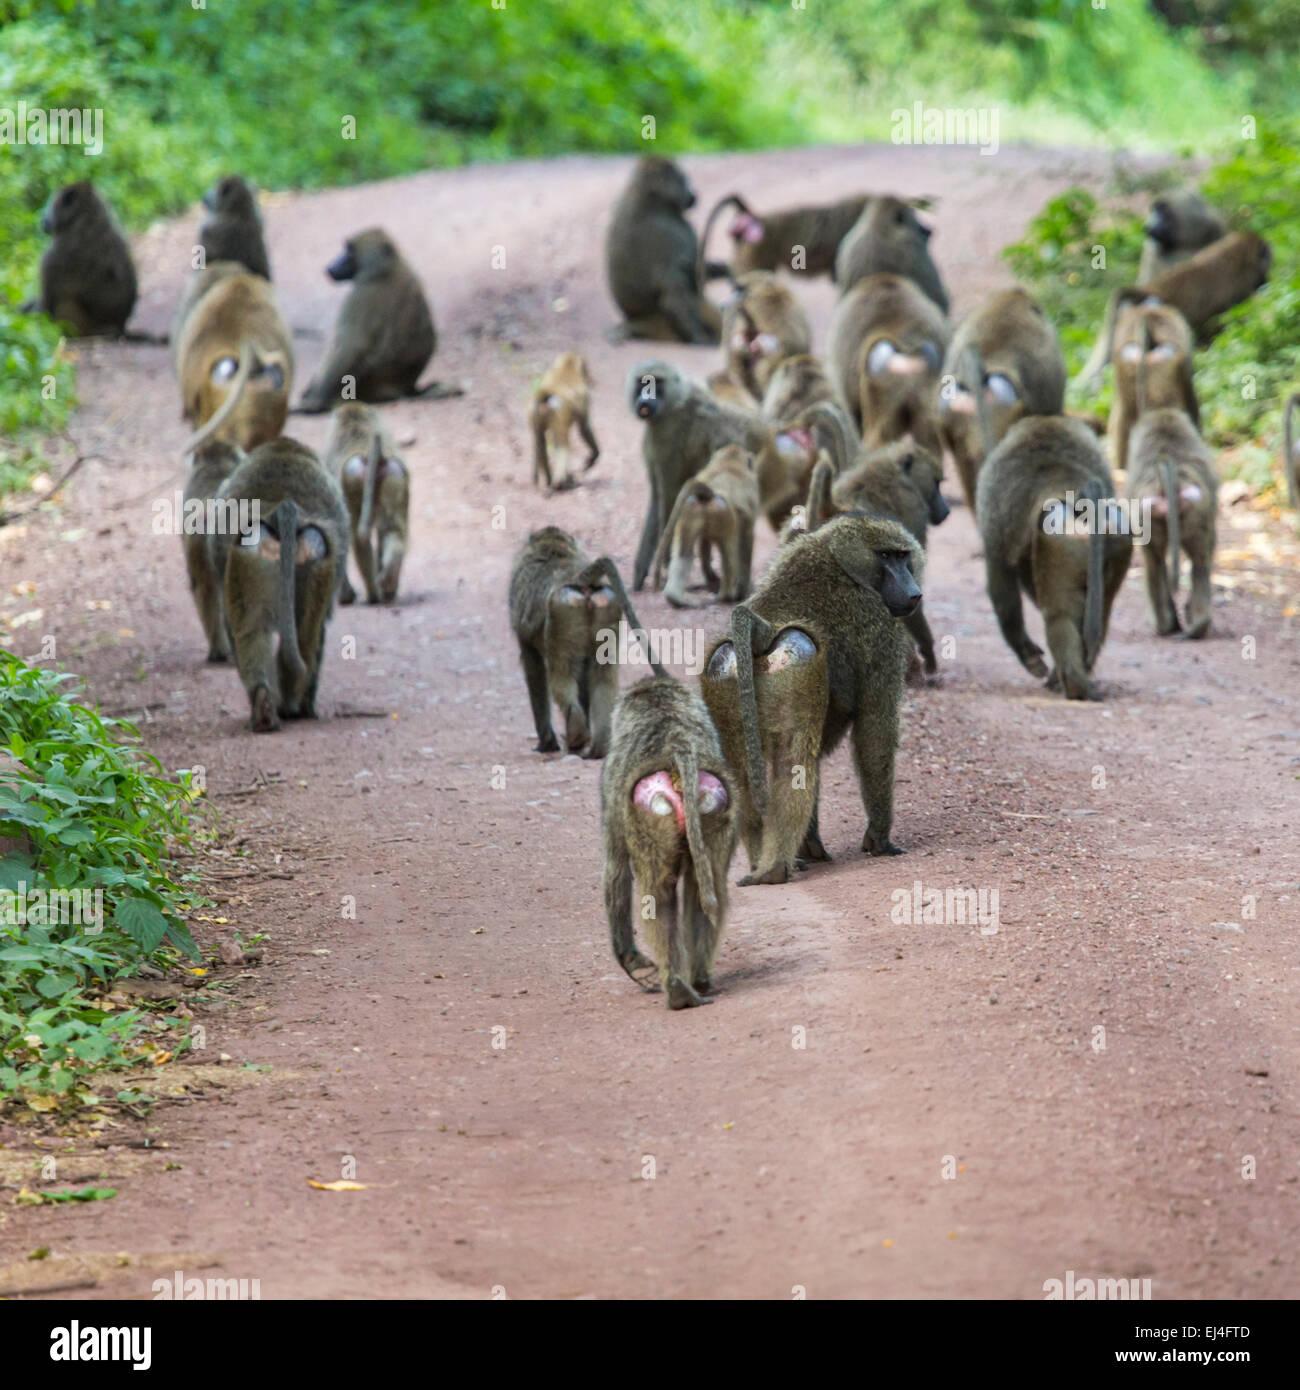 Group of Baboon monkeys in African bush. Lake Manyara National Park in Tanzania - Stock Image